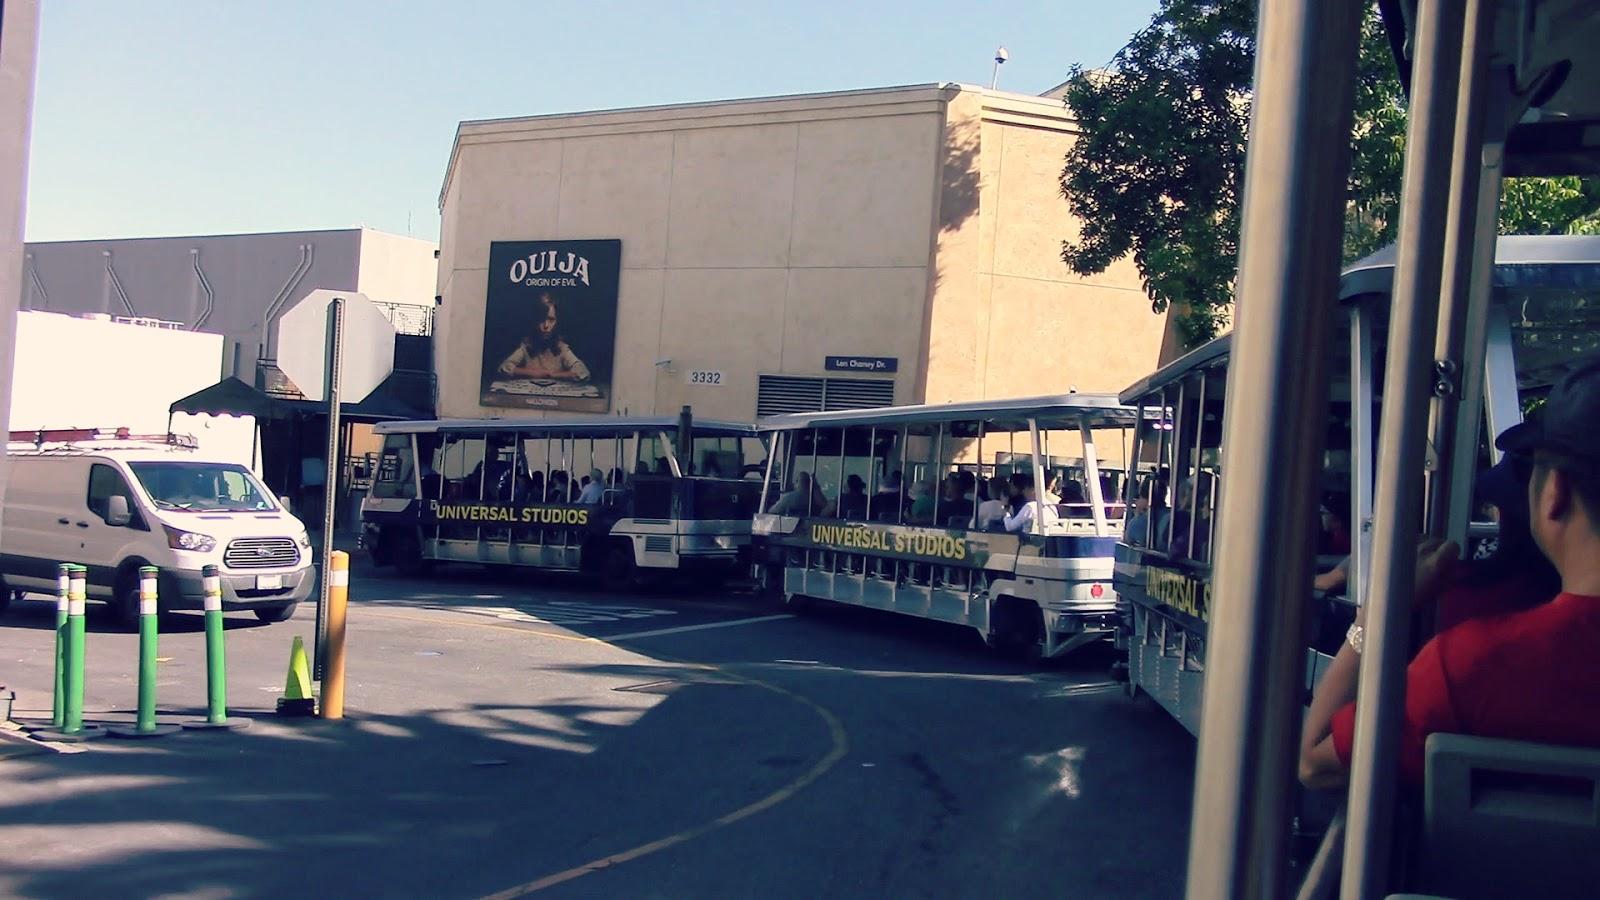 Studios Tour à Universal Studios